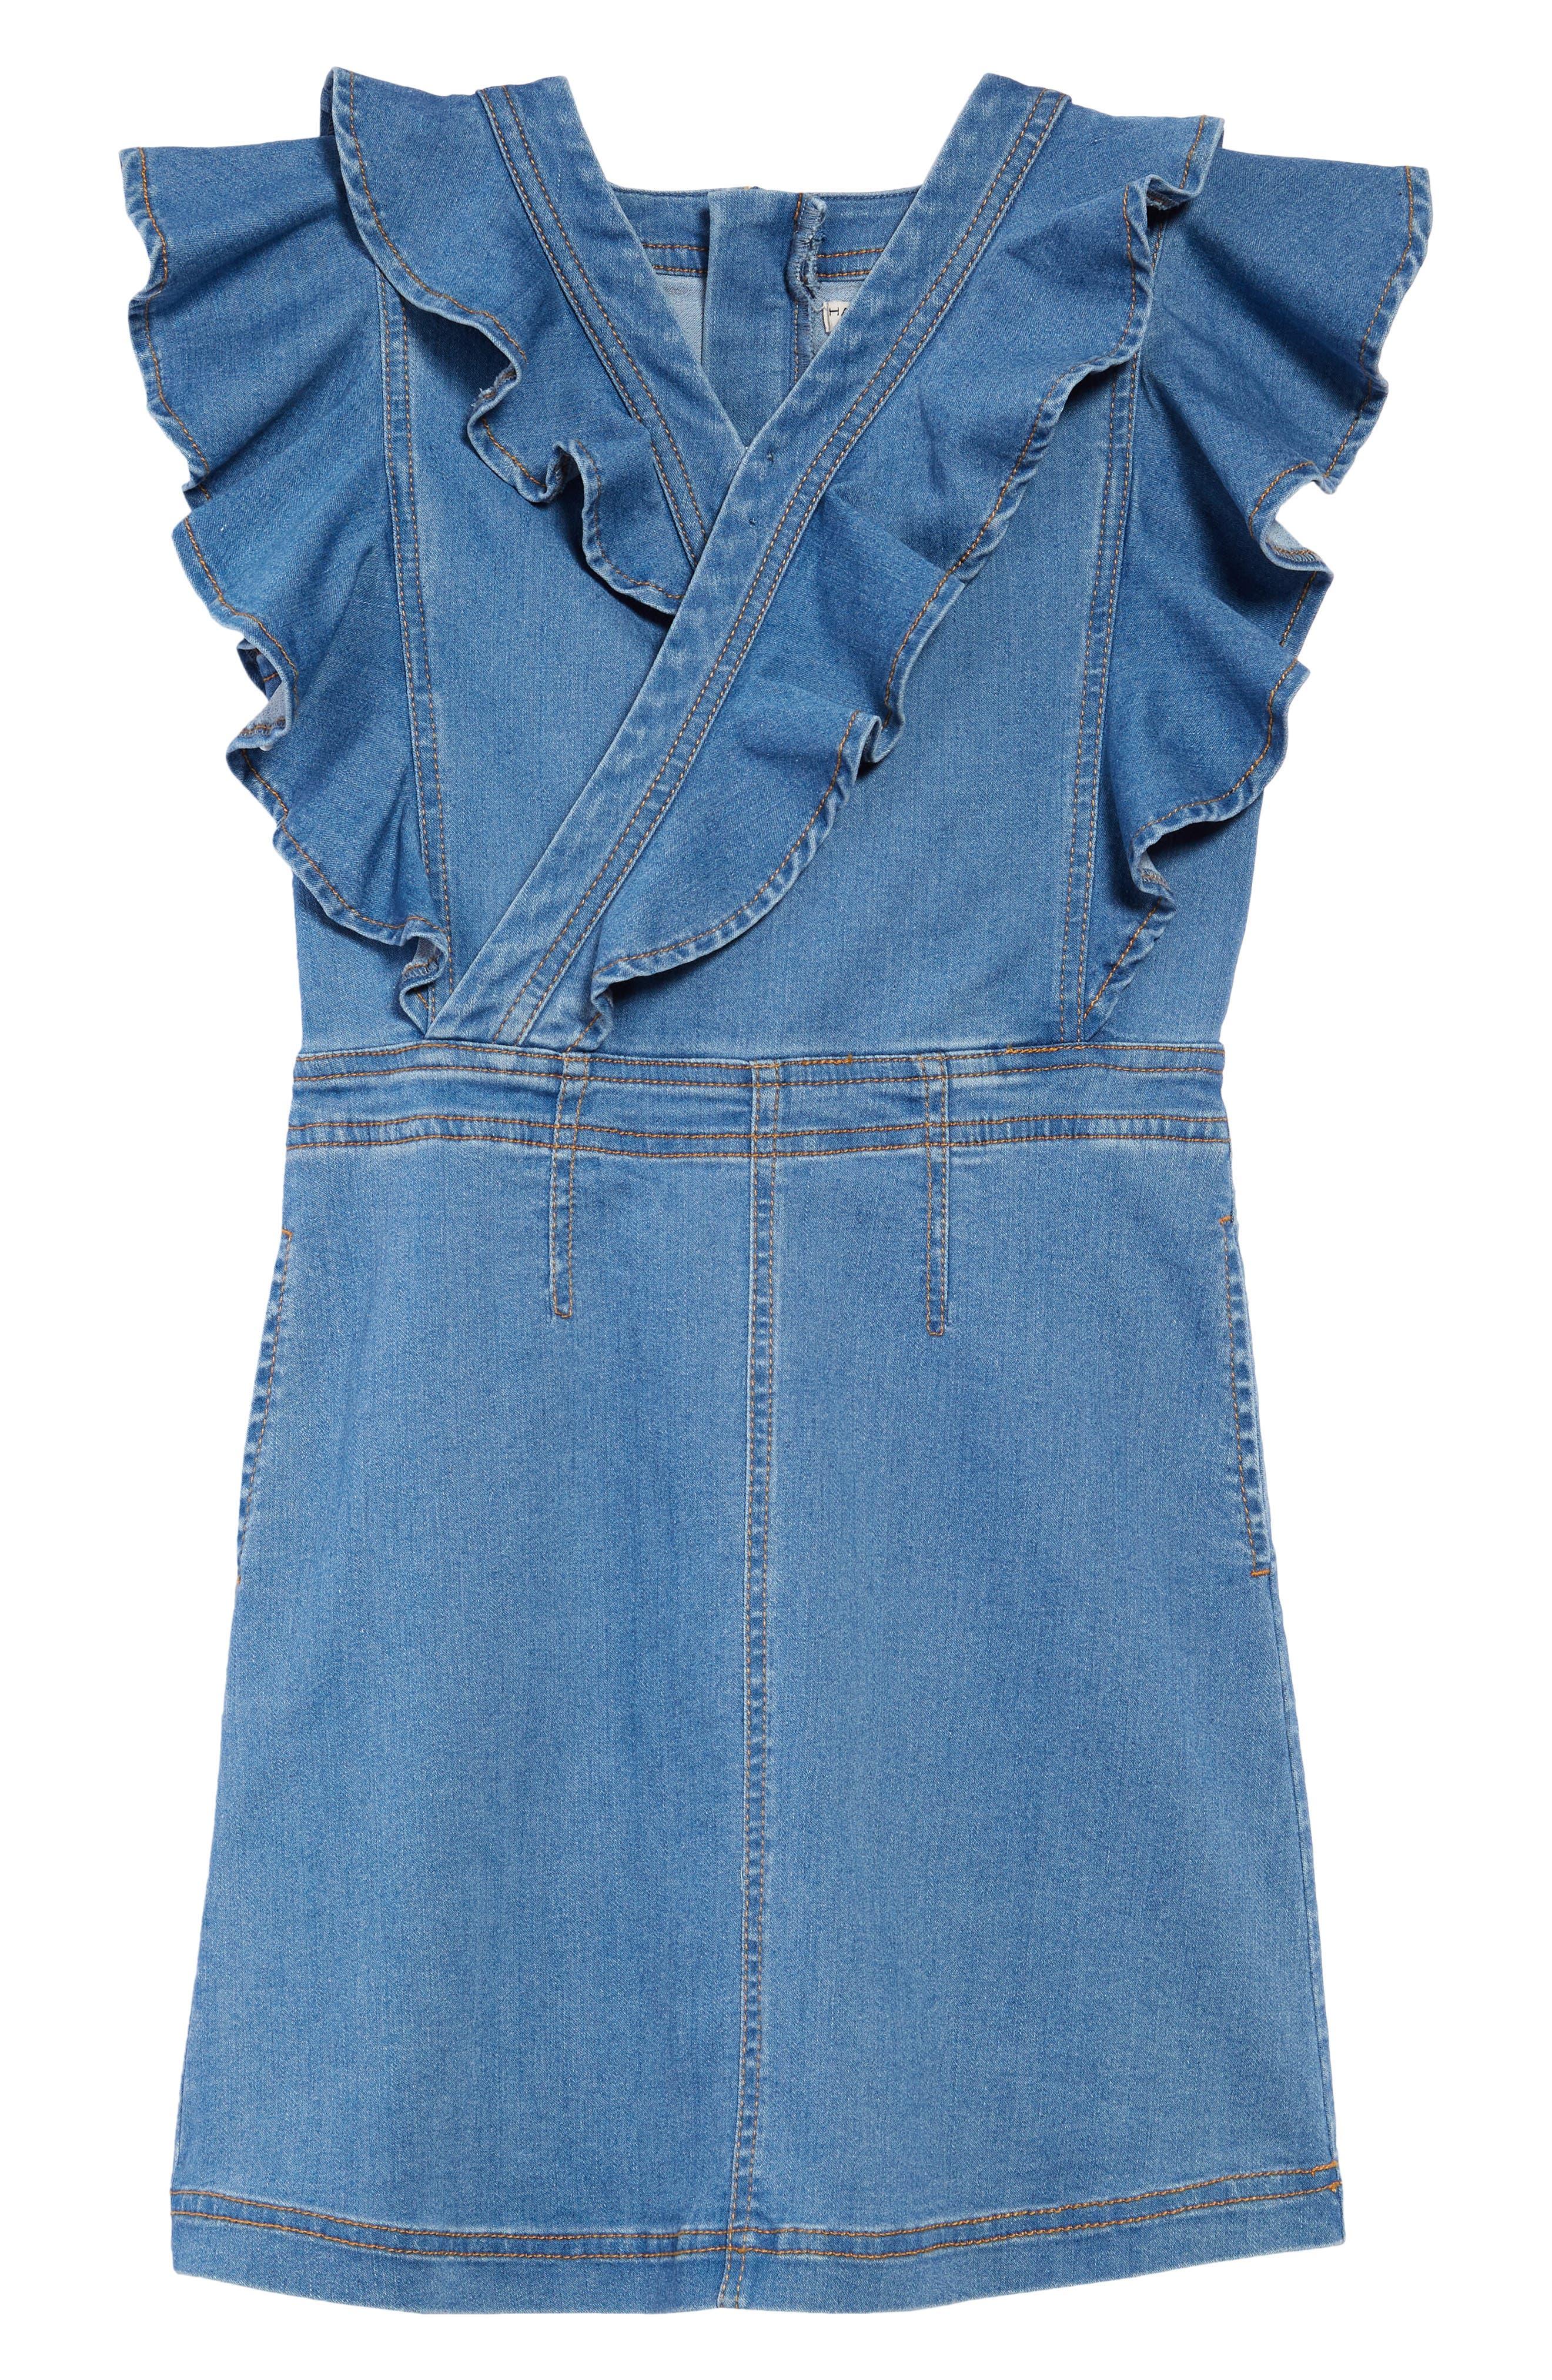 Blue Jean Dresses,blue jean dress,